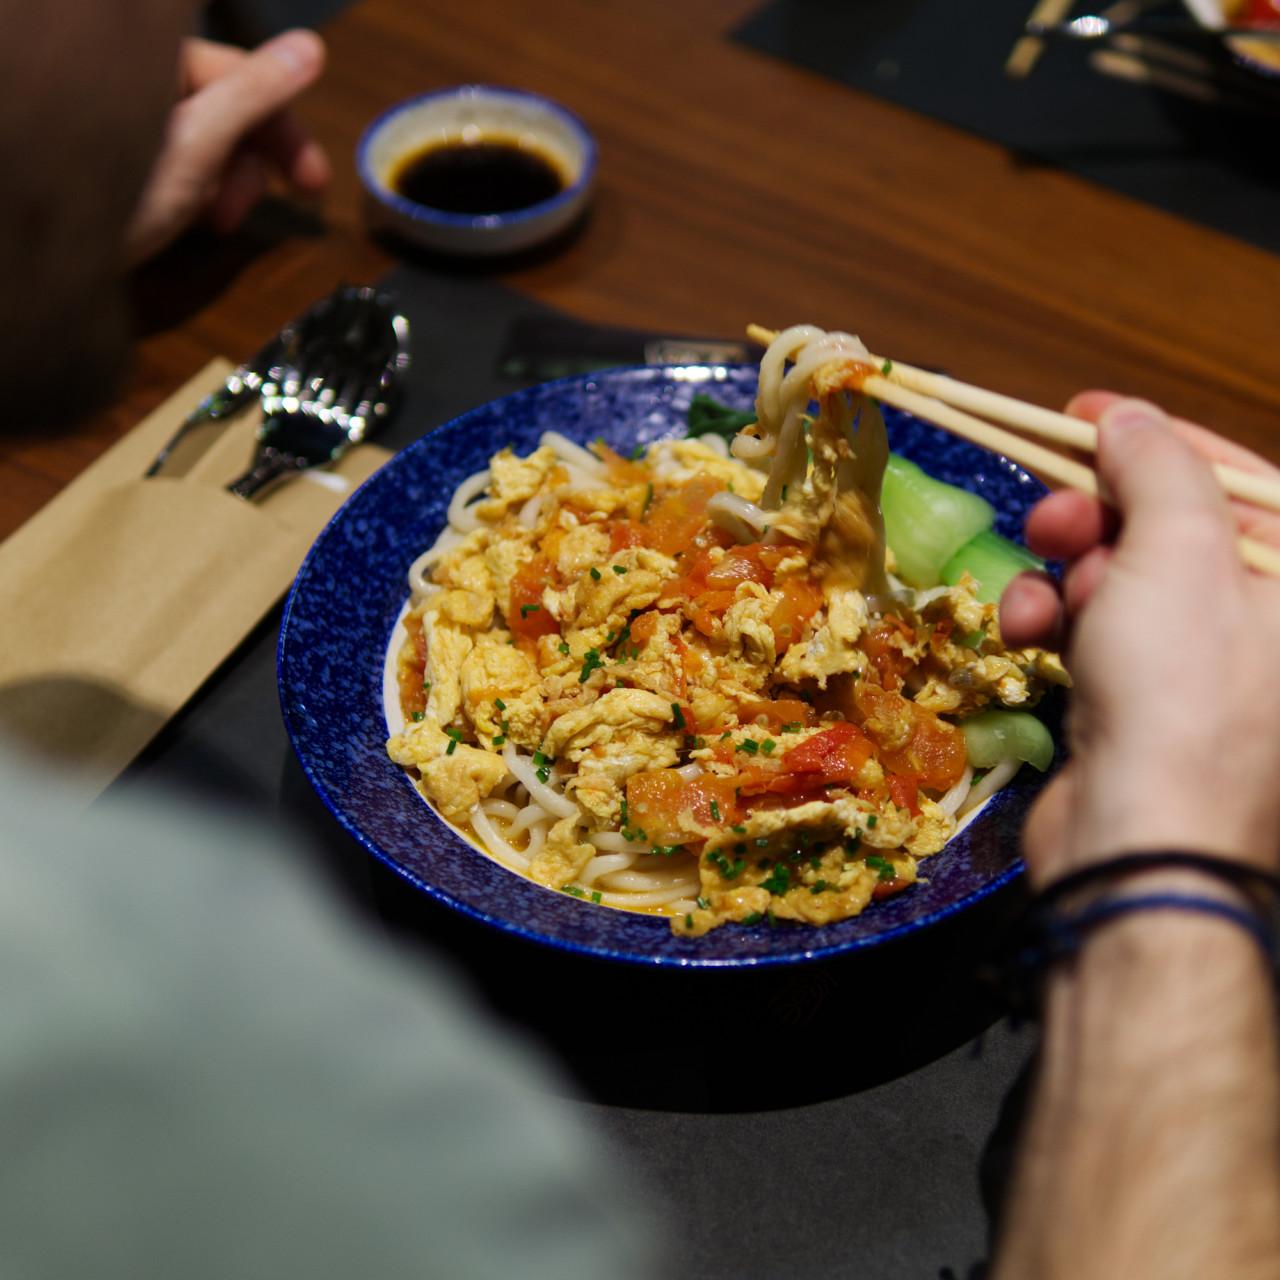 Vegi Nudel Gericht - man kann sich fast nicht satt genug essen! Foto: Lunchgate/Daniel/Ruedi Beck (Nuxara Productions)